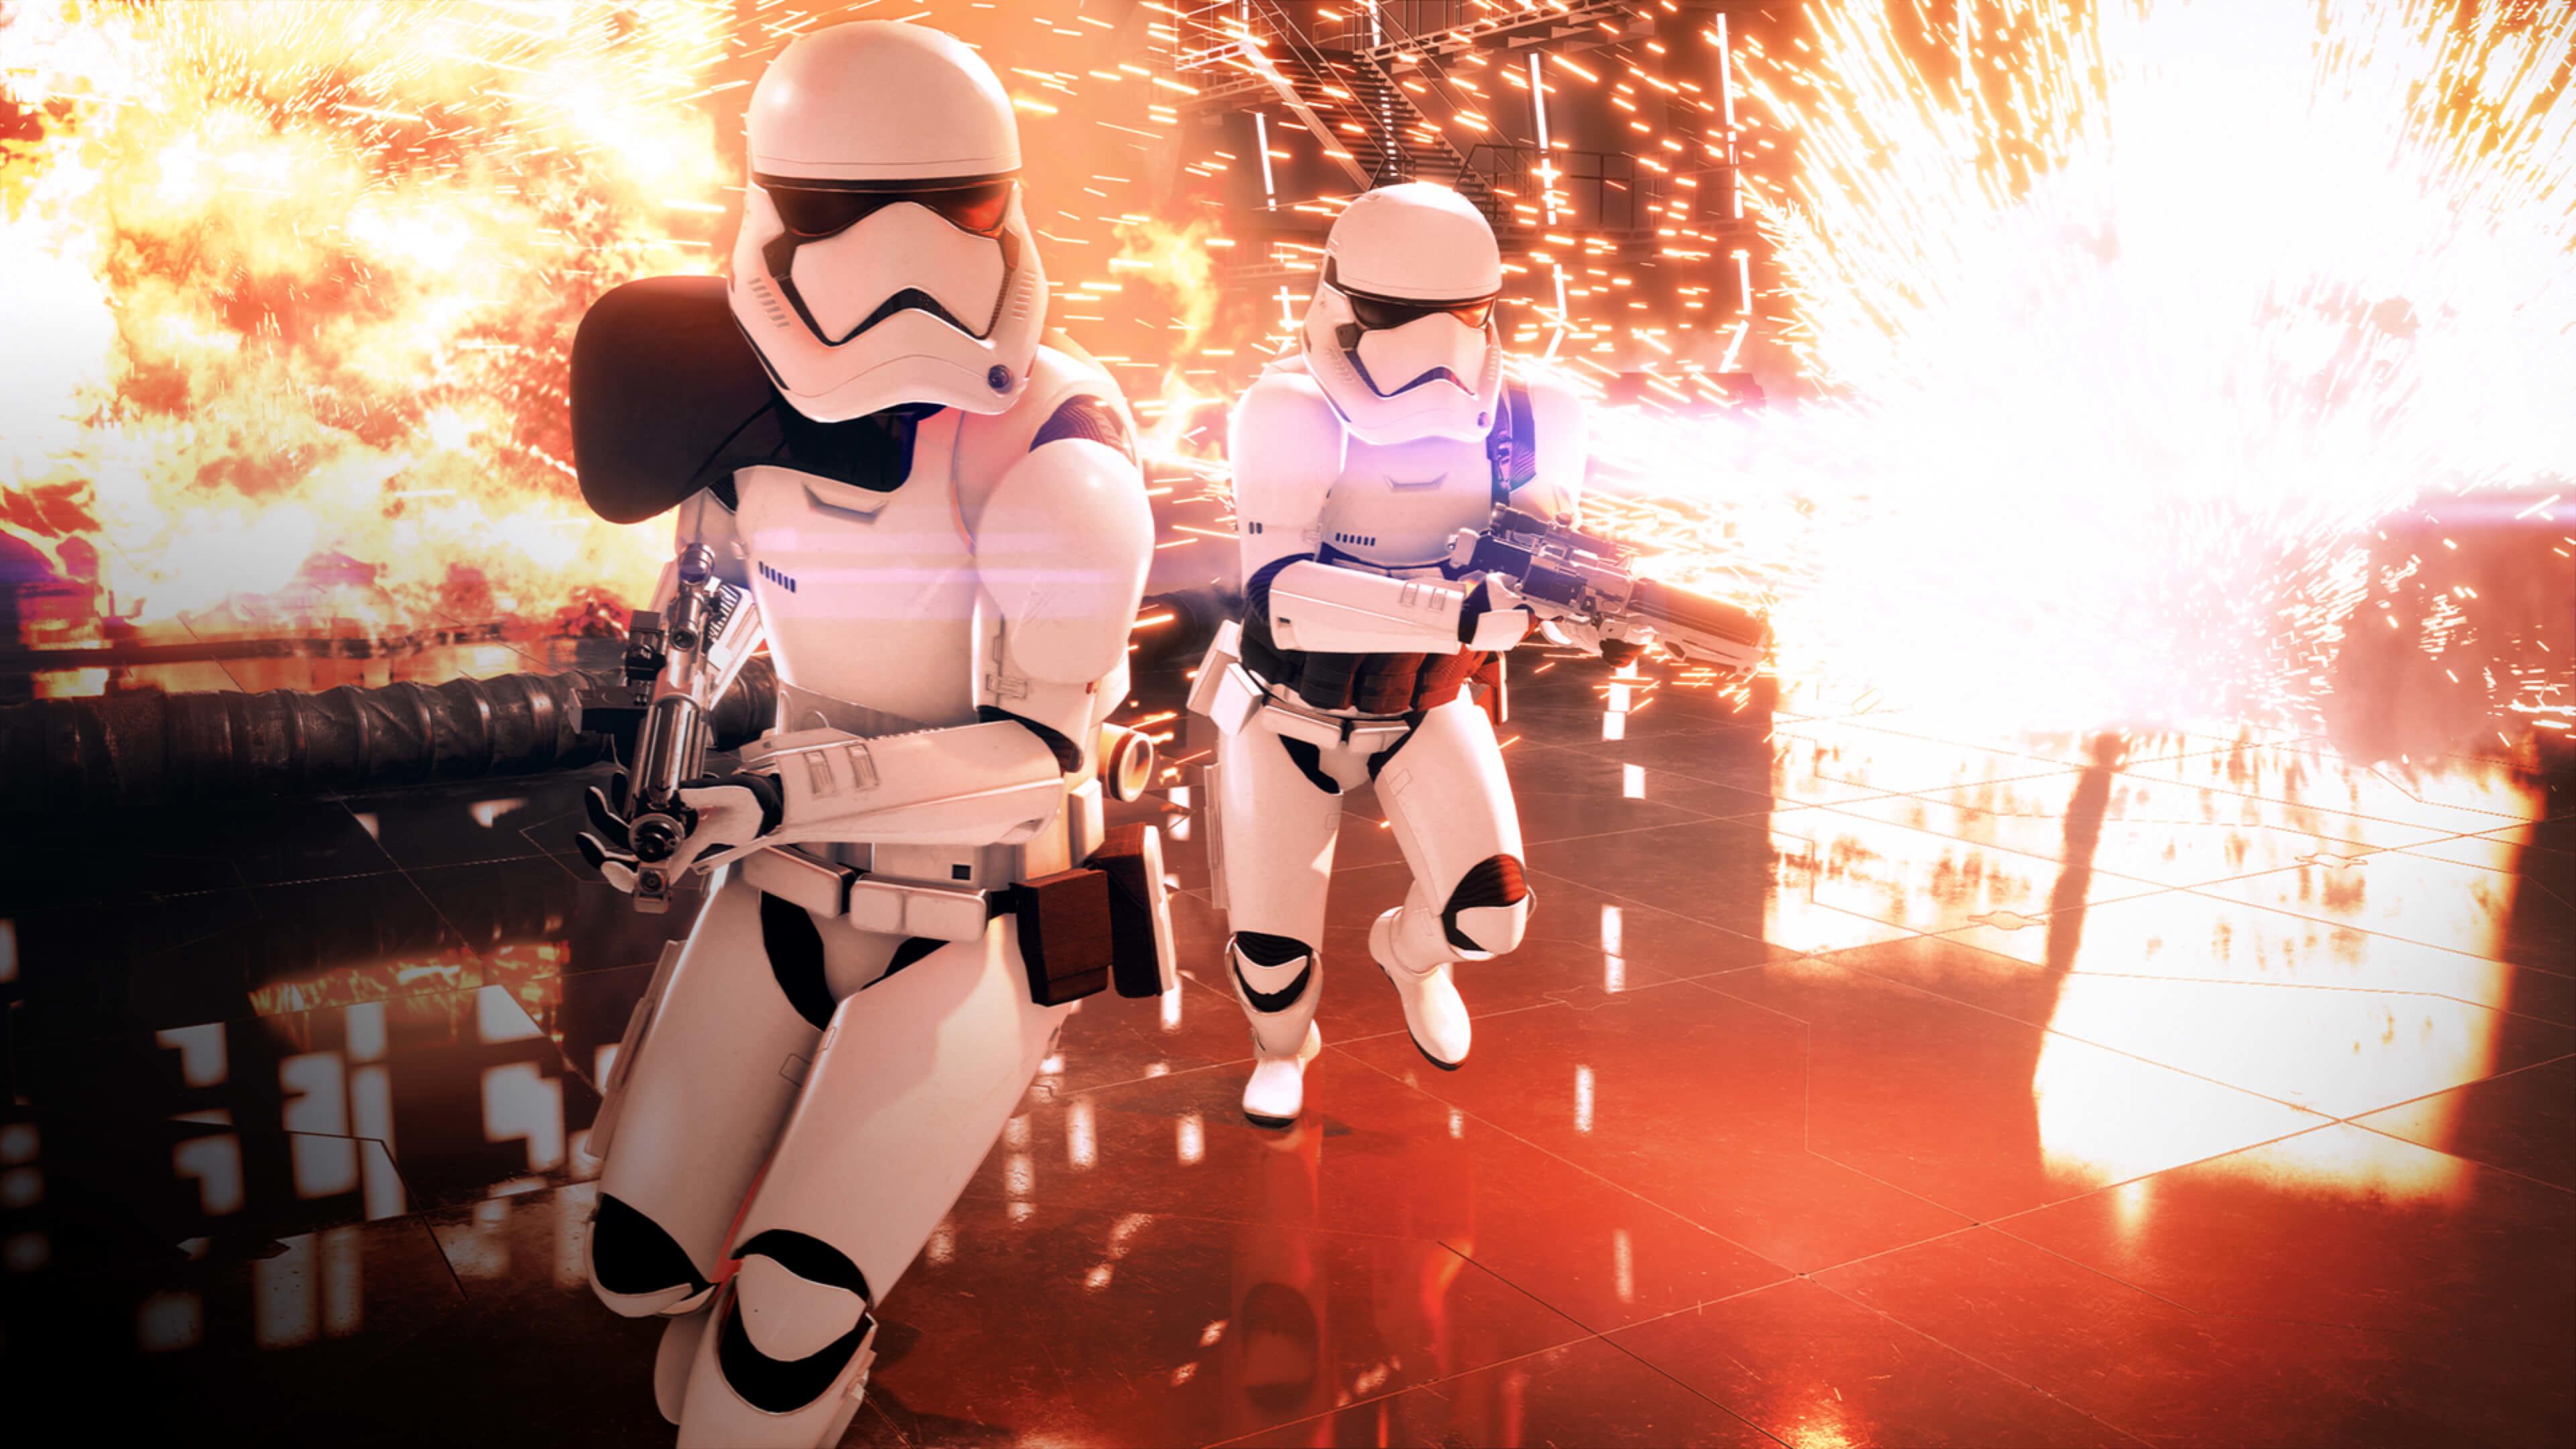 … Last Jedi Wallpaper 'Rey and Kylo' · Star Wars EA Battlefront 2 Wallpaper  HD …